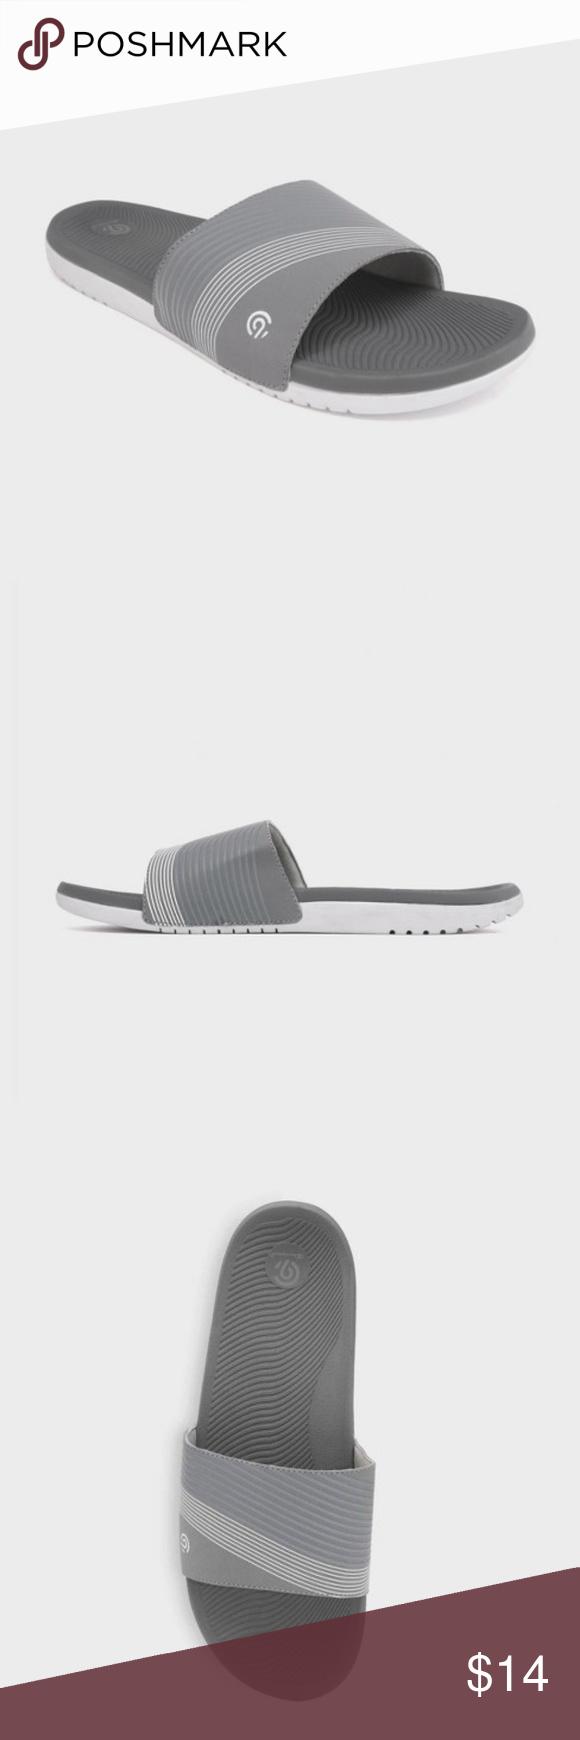 2c1ebf81c59189 Men s Jerry Slide Sandals - C9 Champion Grey Men s Jerry Slide Sandals - C9  Champion Grey